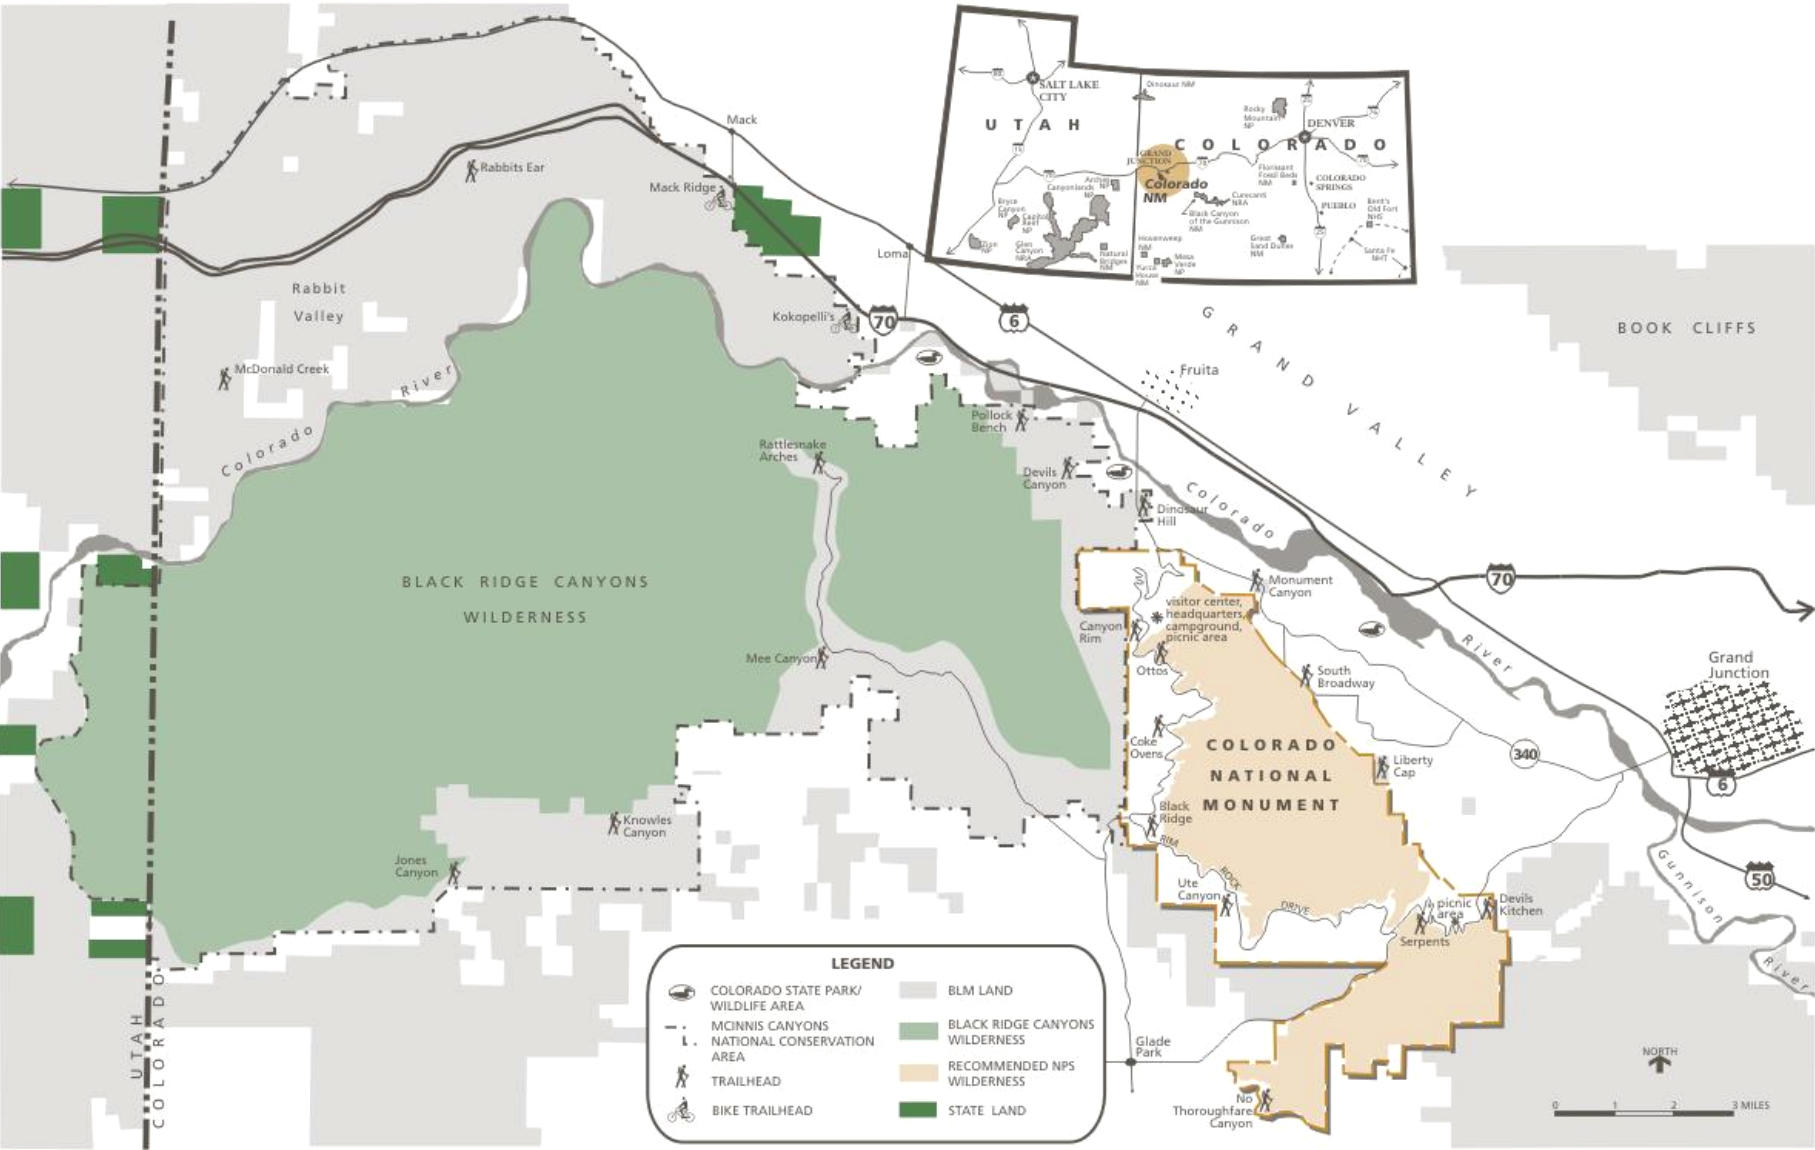 File:NPS colorado-national-monument-regional-map.jpg ...